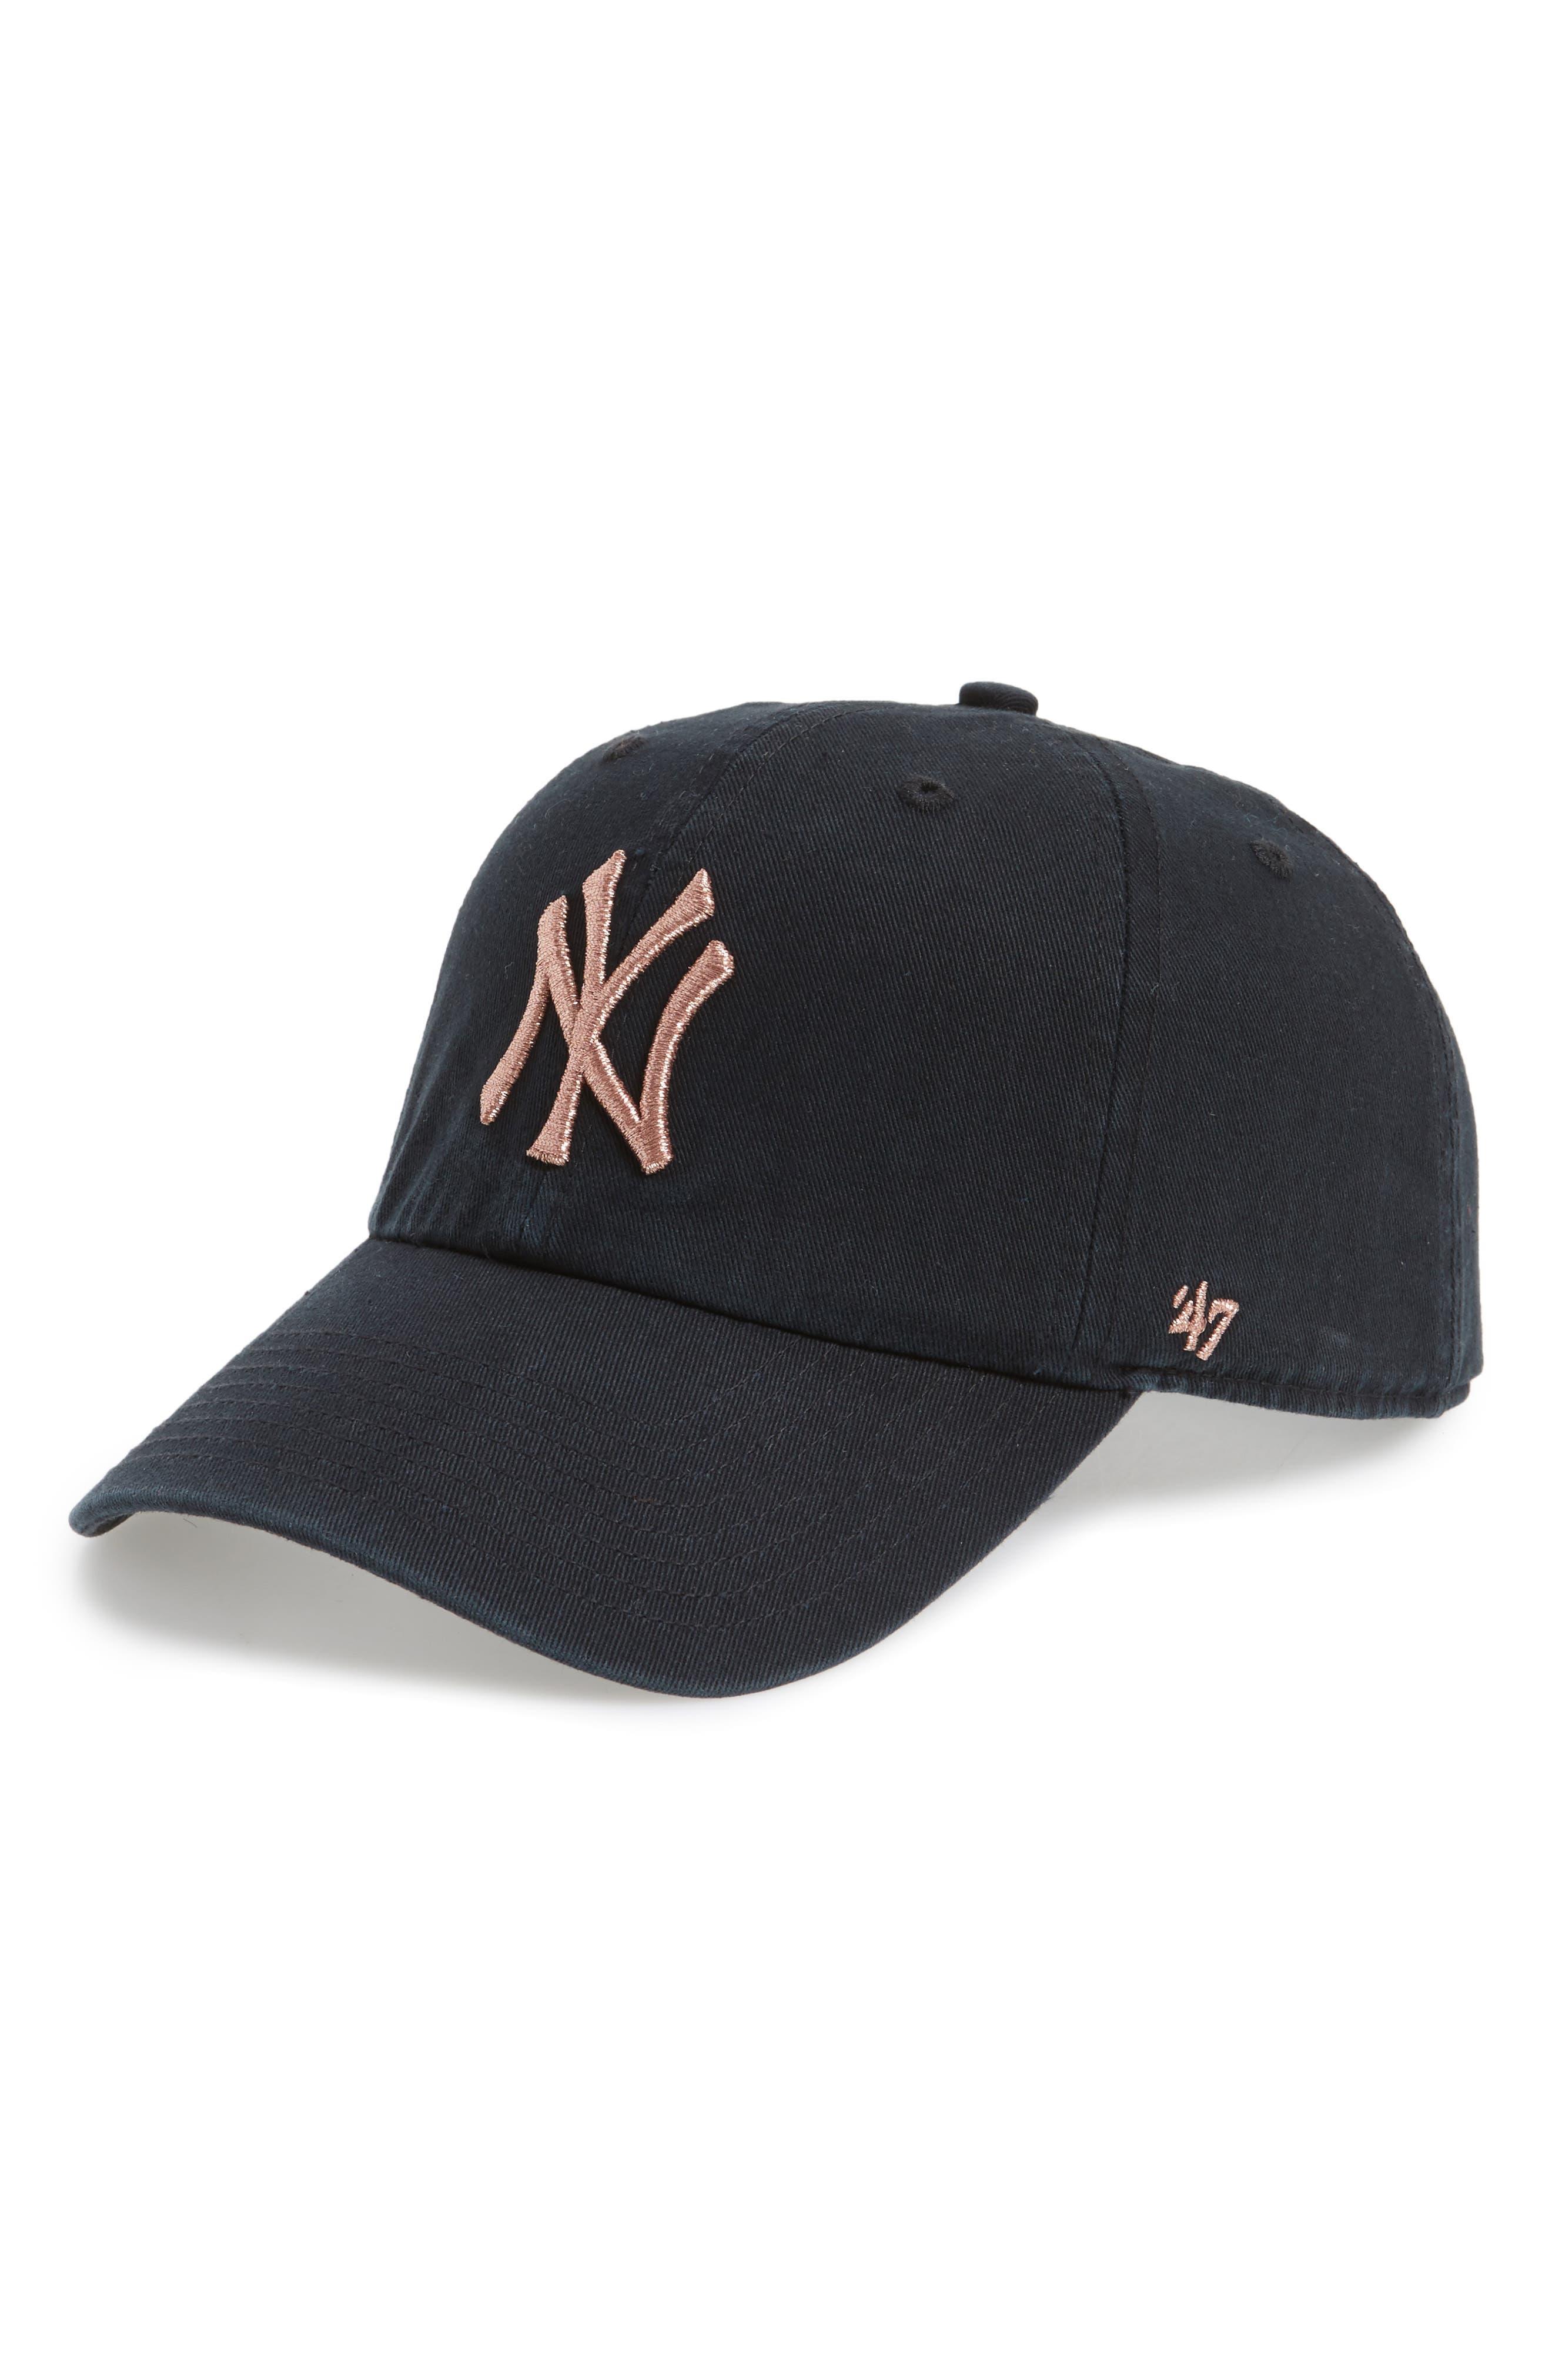 7c5b6d9db13a1e Hats for Women | Nordstrom